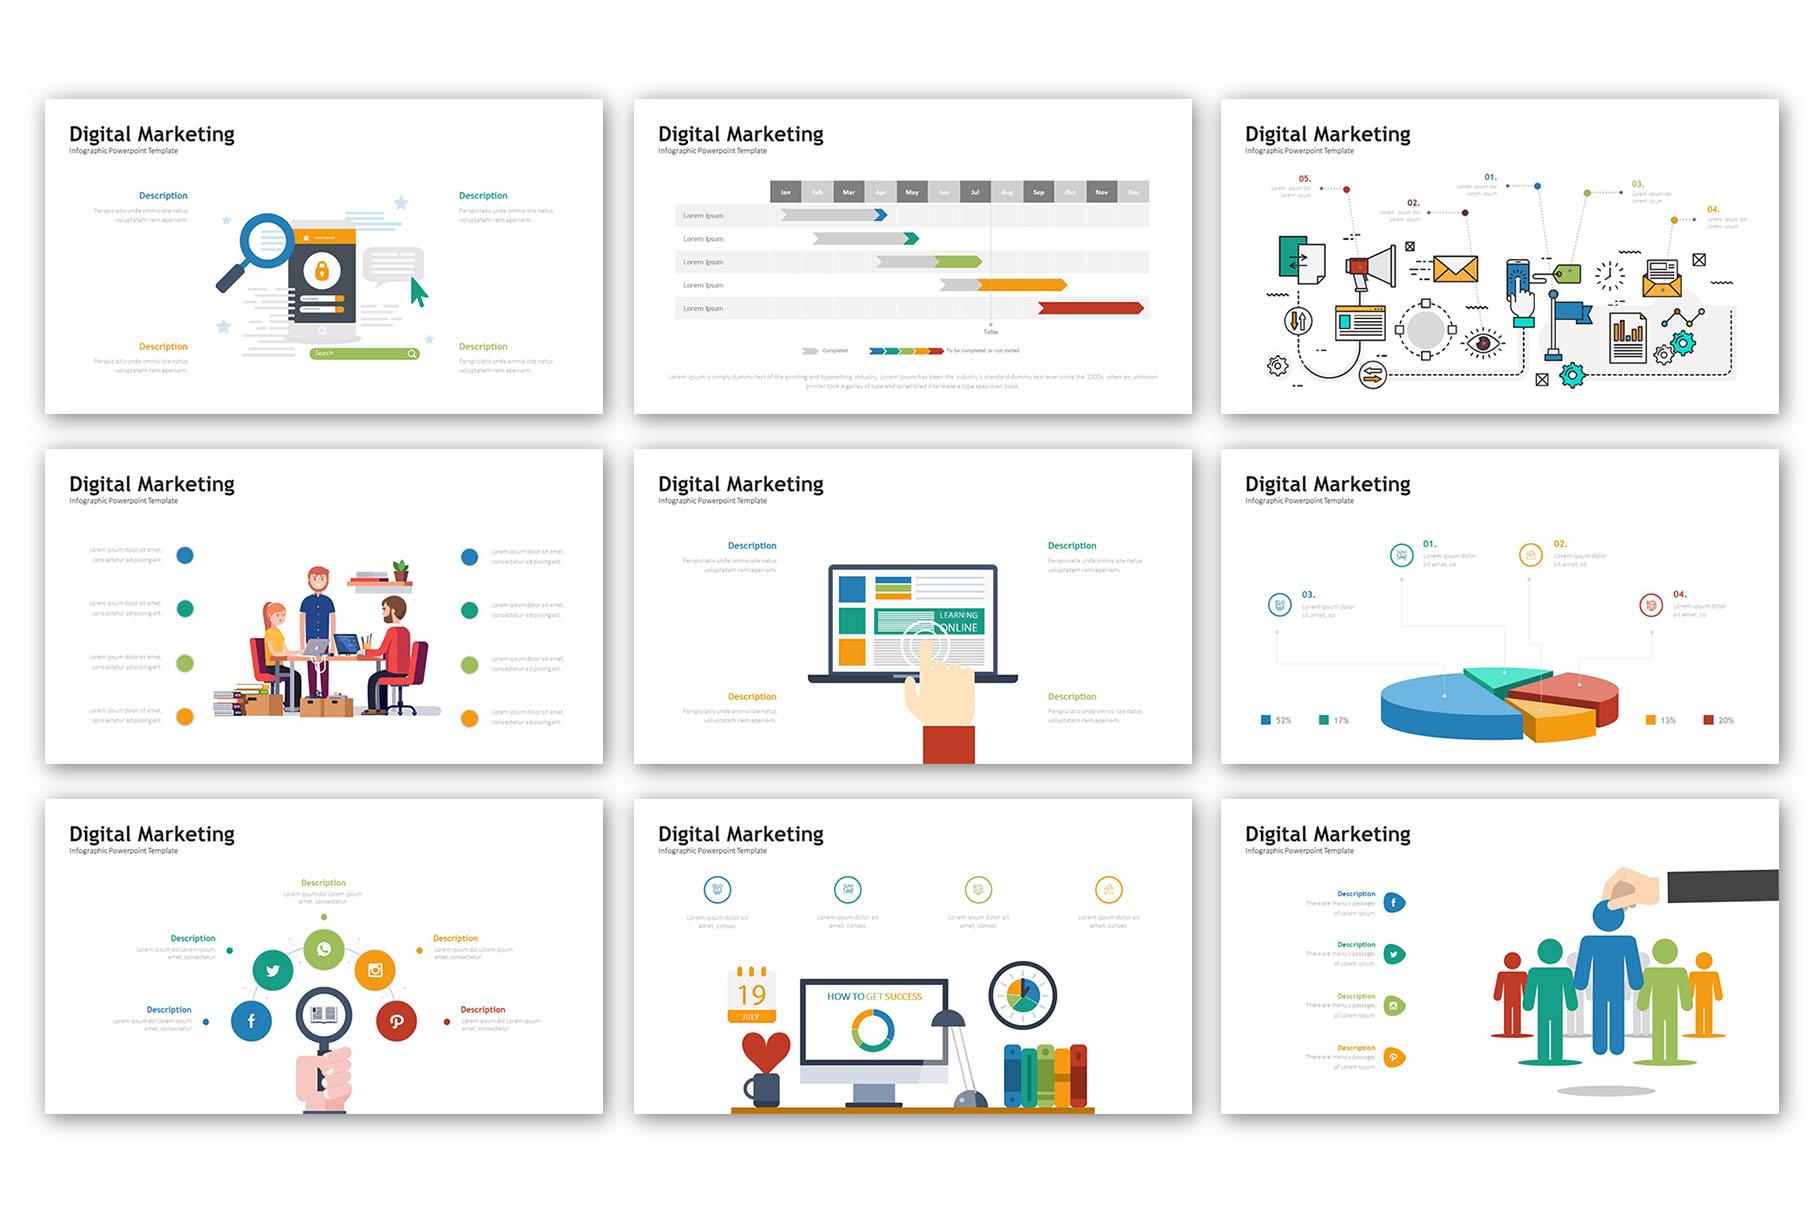 Digital Marketing Presentation - Infographic Template example image 4